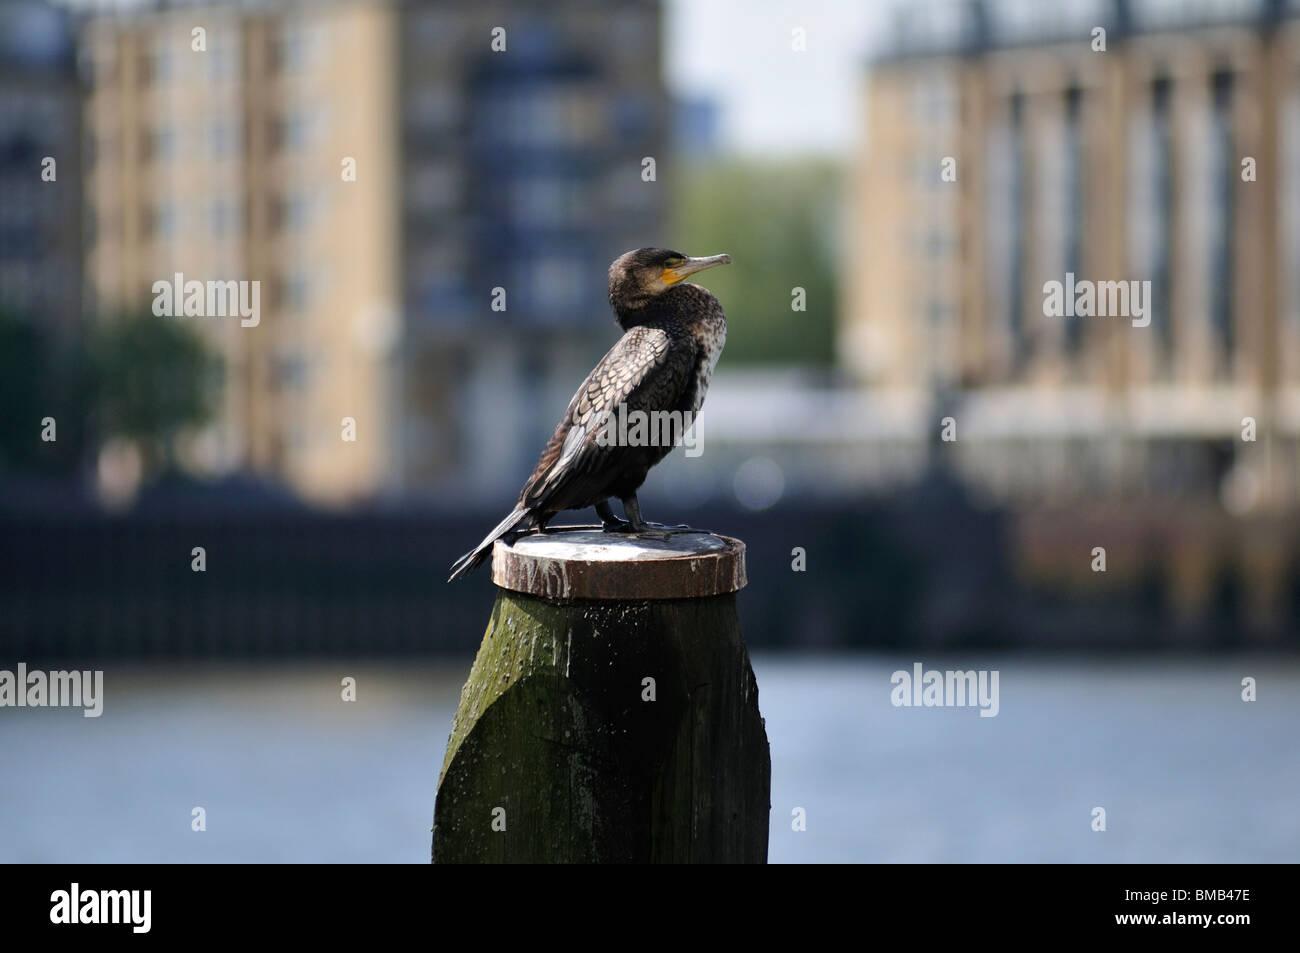 Cormorant, River Thames, London, United Kingdom - Stock Image